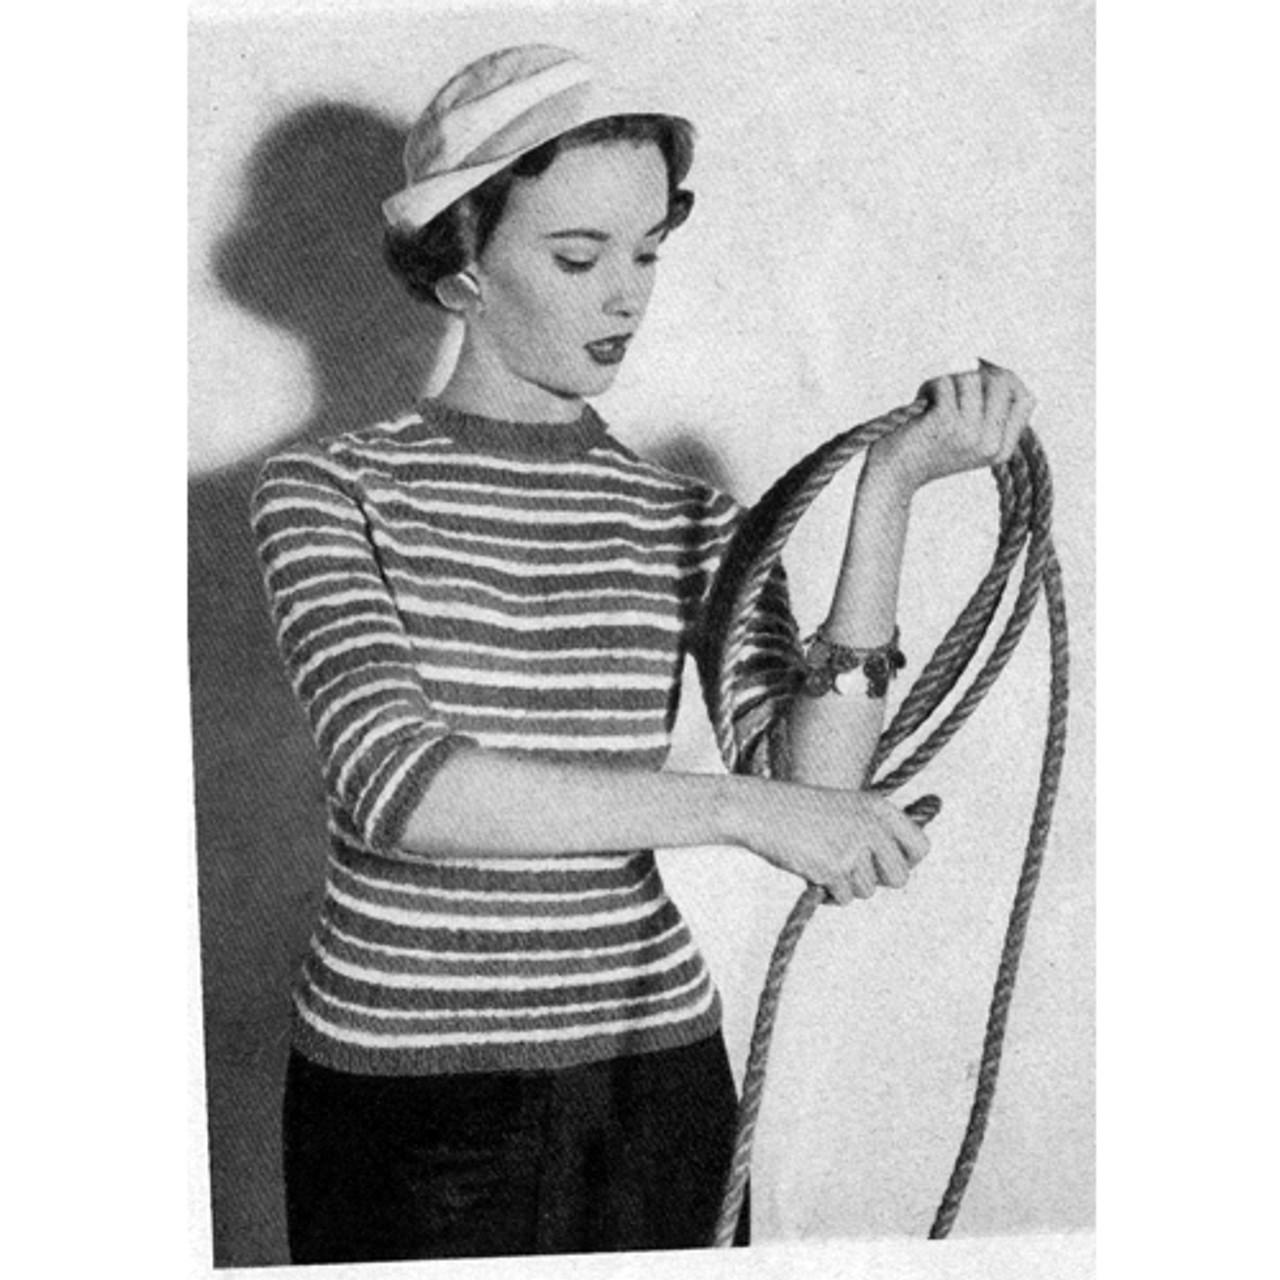 Bucilla Nubby Knit Strip Pullover Pattern